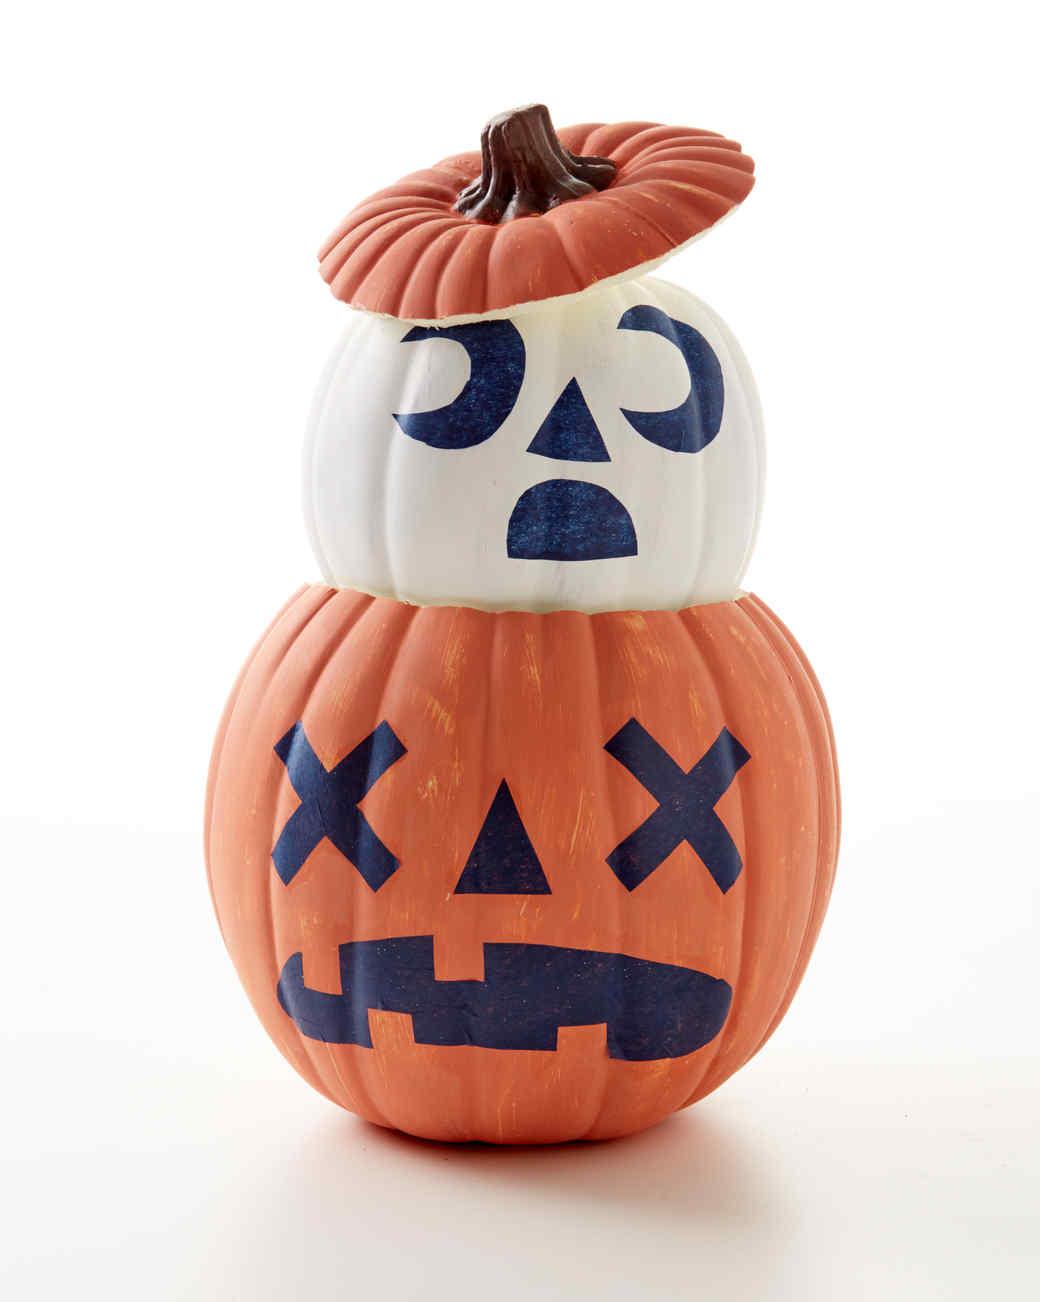 ghostbusters-pumpkin-0009-d112573.jpg